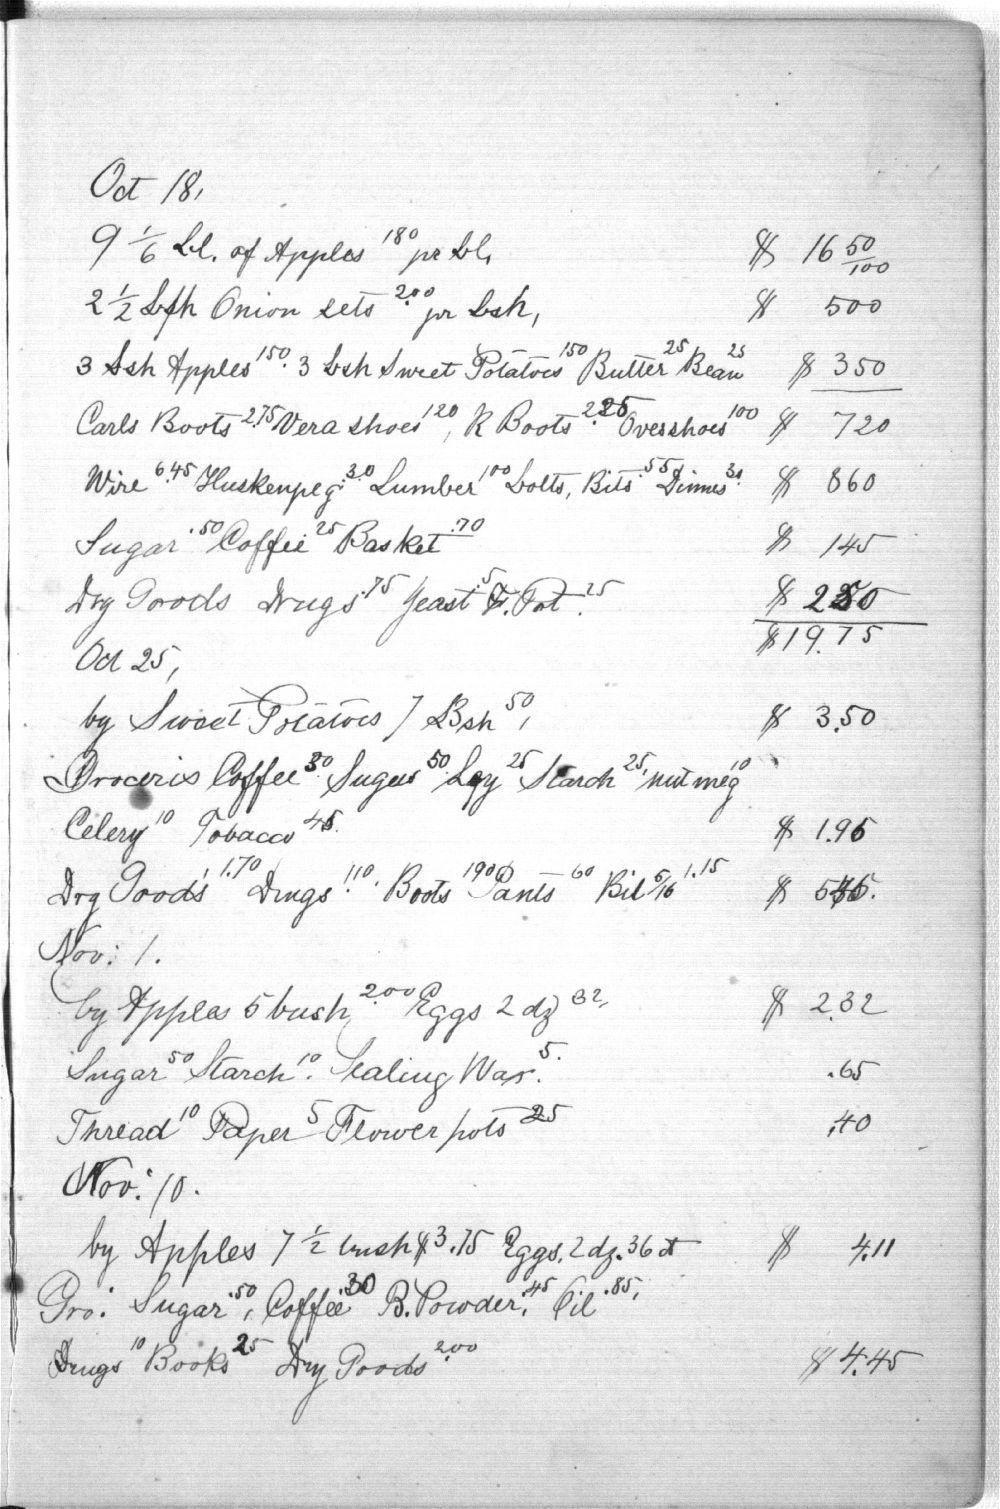 Augusta Bruchmiller memorandum book - 11